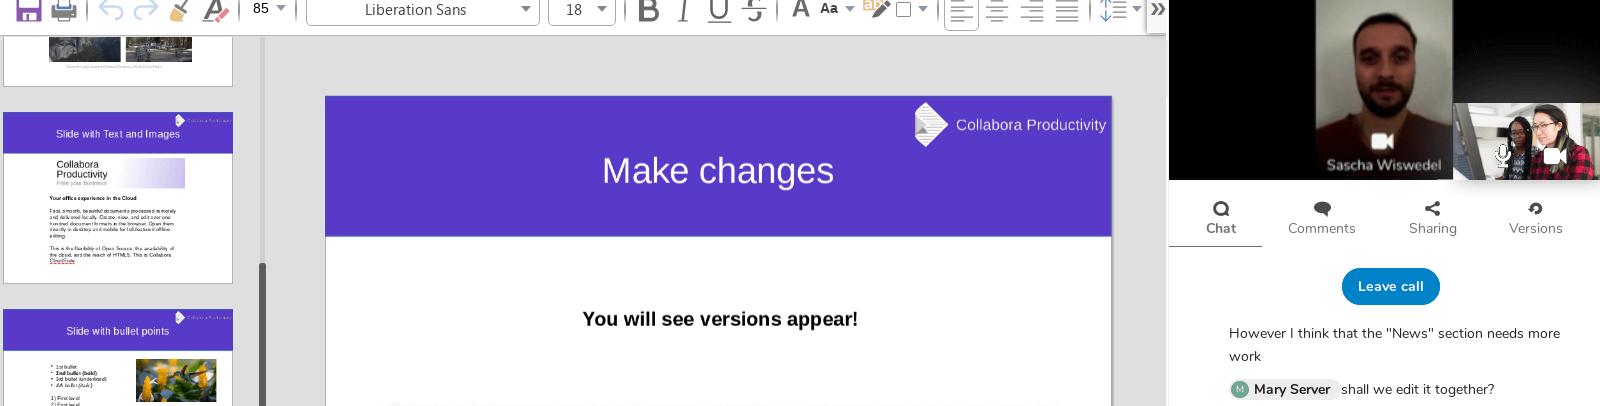 Nextcloud Talk 5 0, Android 3 4 0 and Contacts 3 0 – Nextcloud